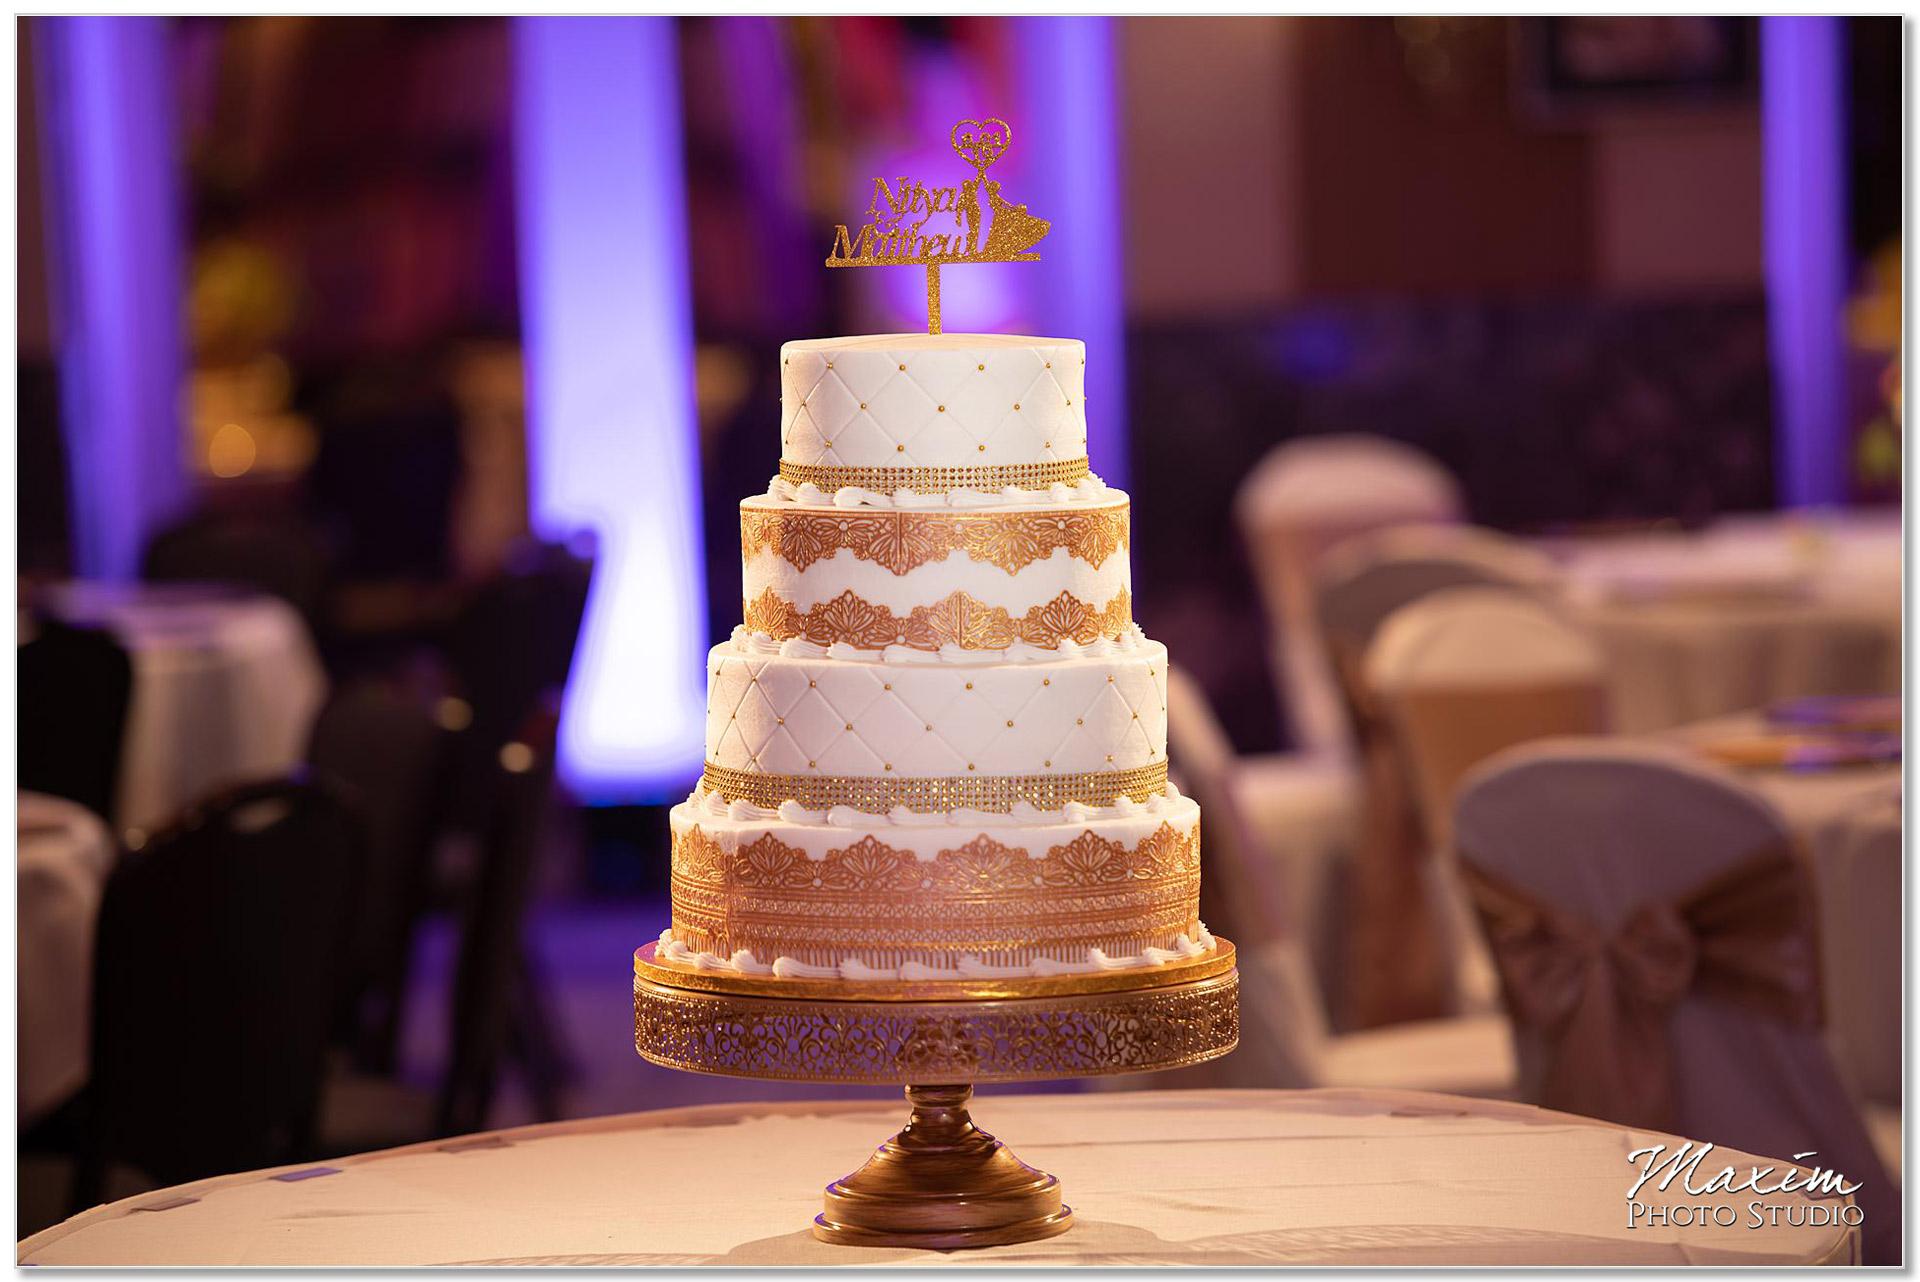 Hall of Mirrors Hilton Netherland Plaza Wedding Reception Cake